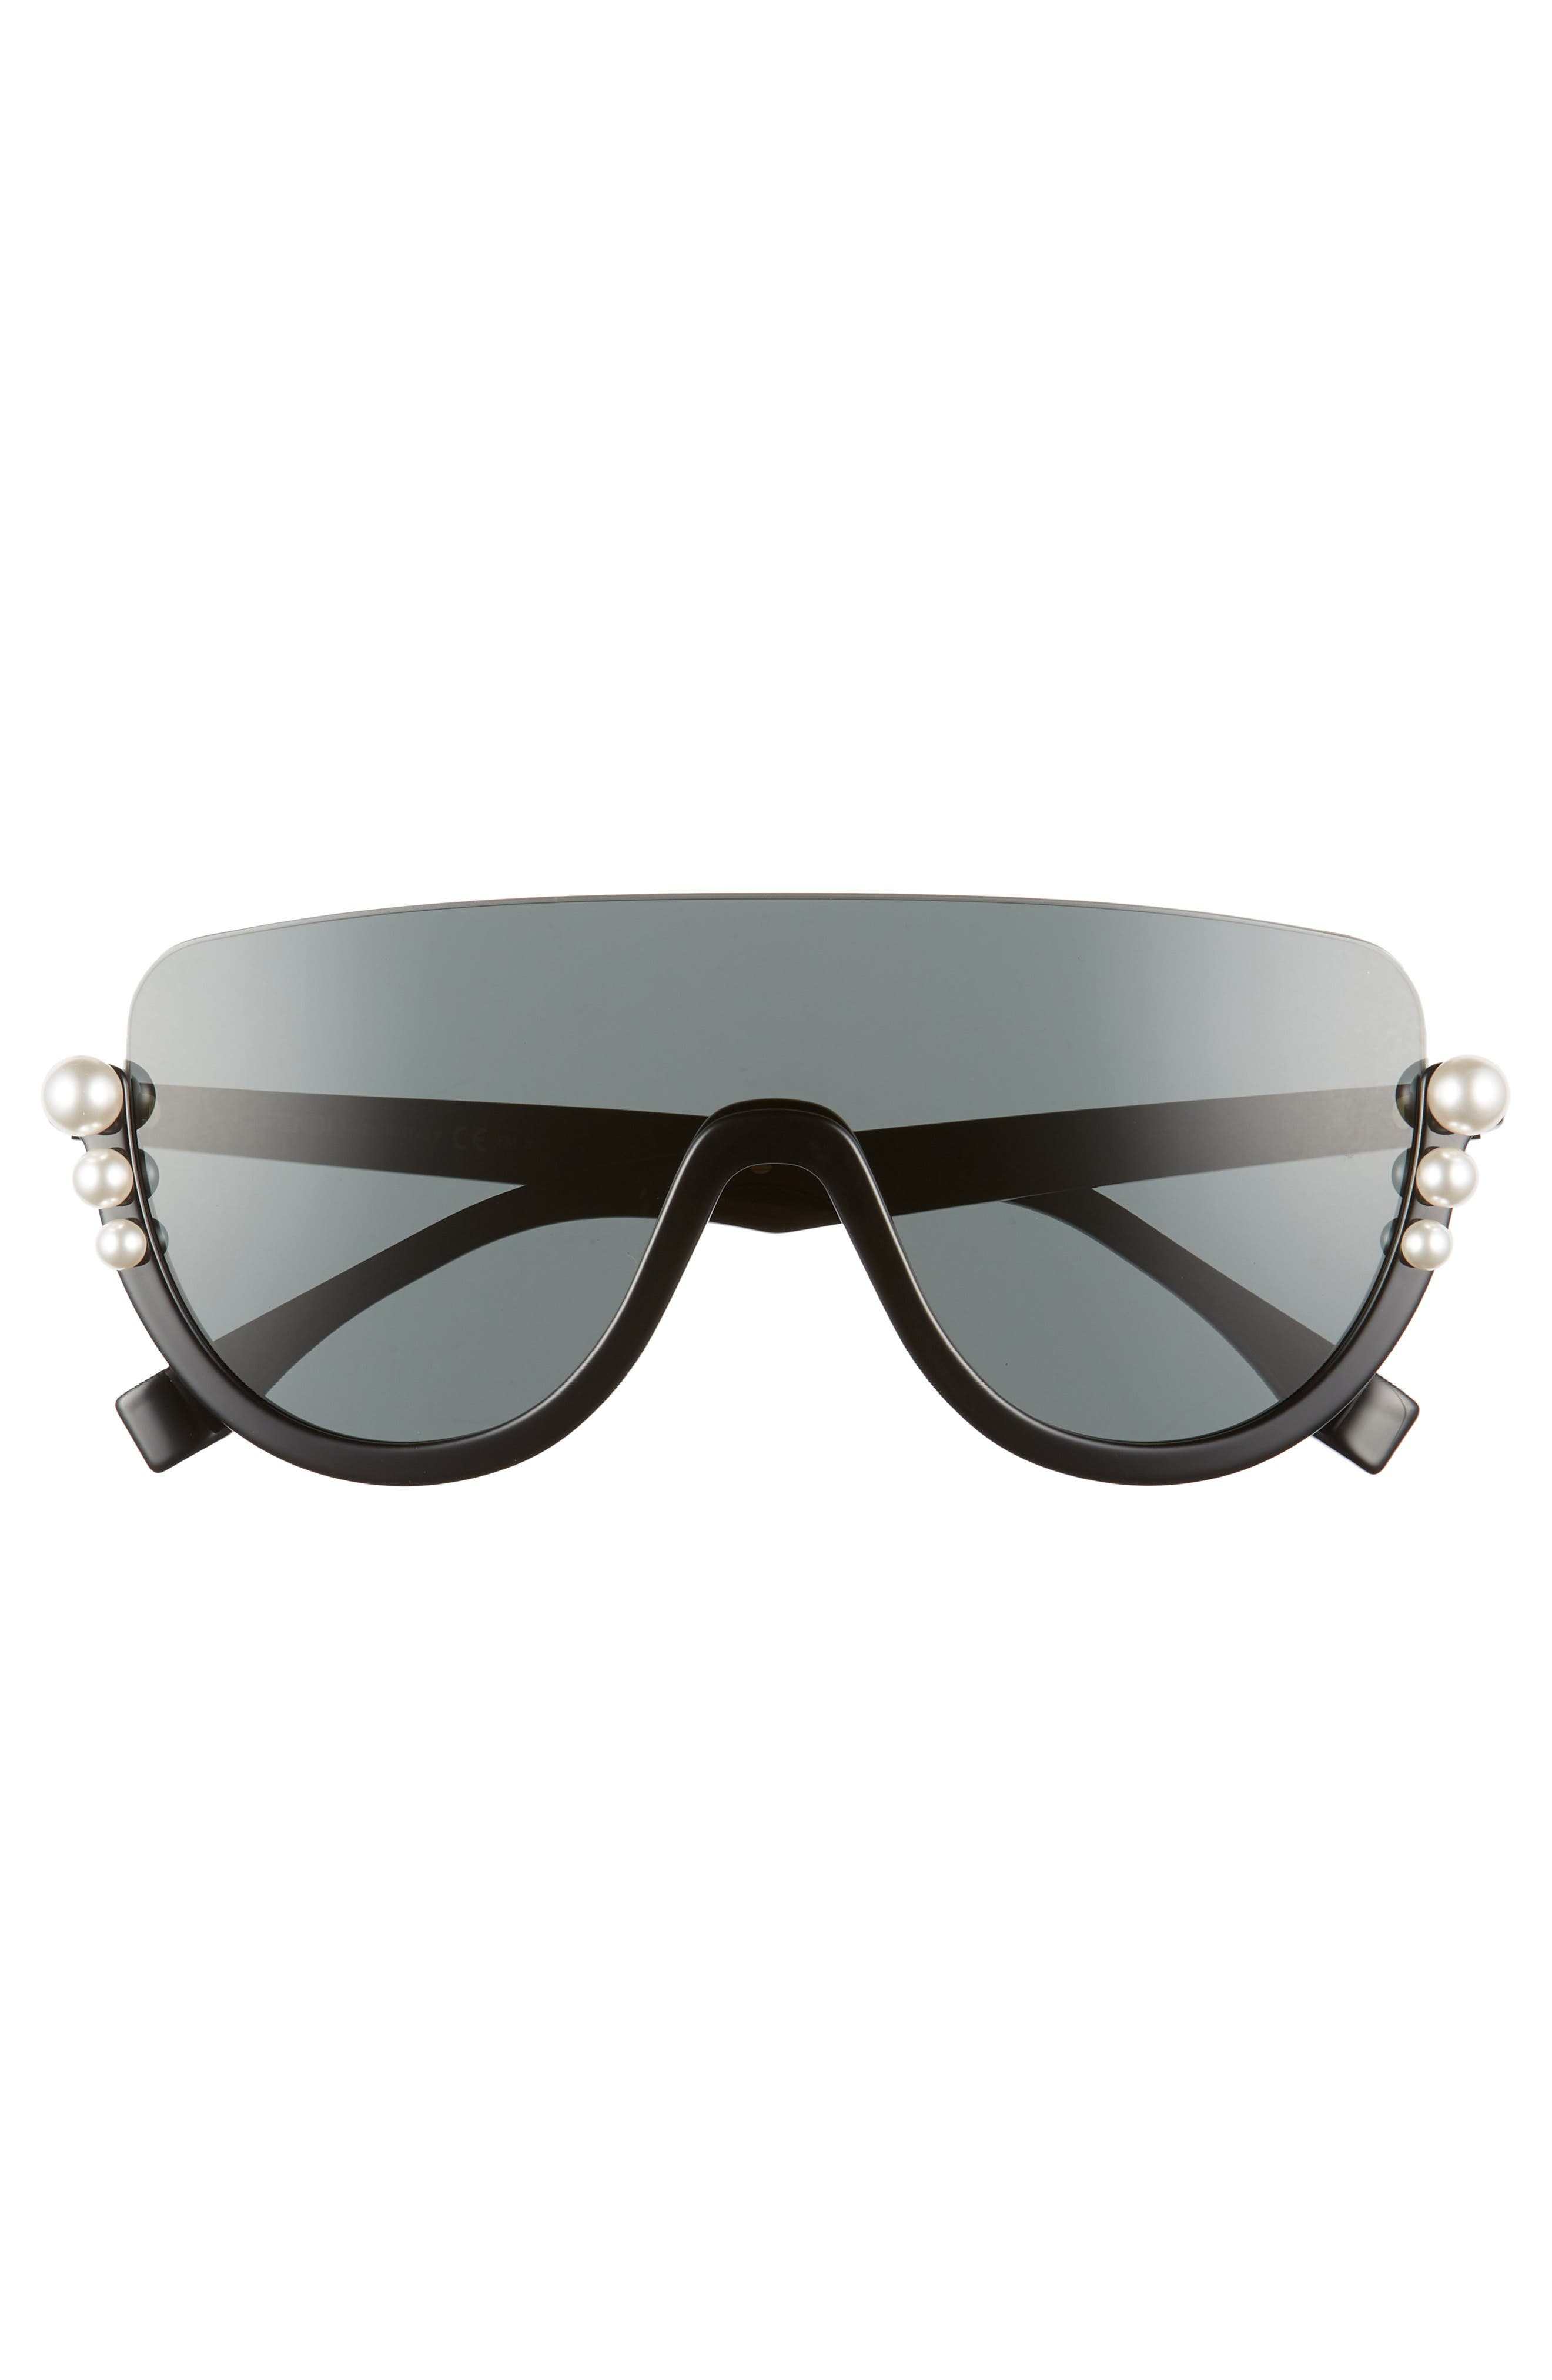 57mm Polarized Rimless Shield Sunglasses,                             Alternate thumbnail 3, color,                             001